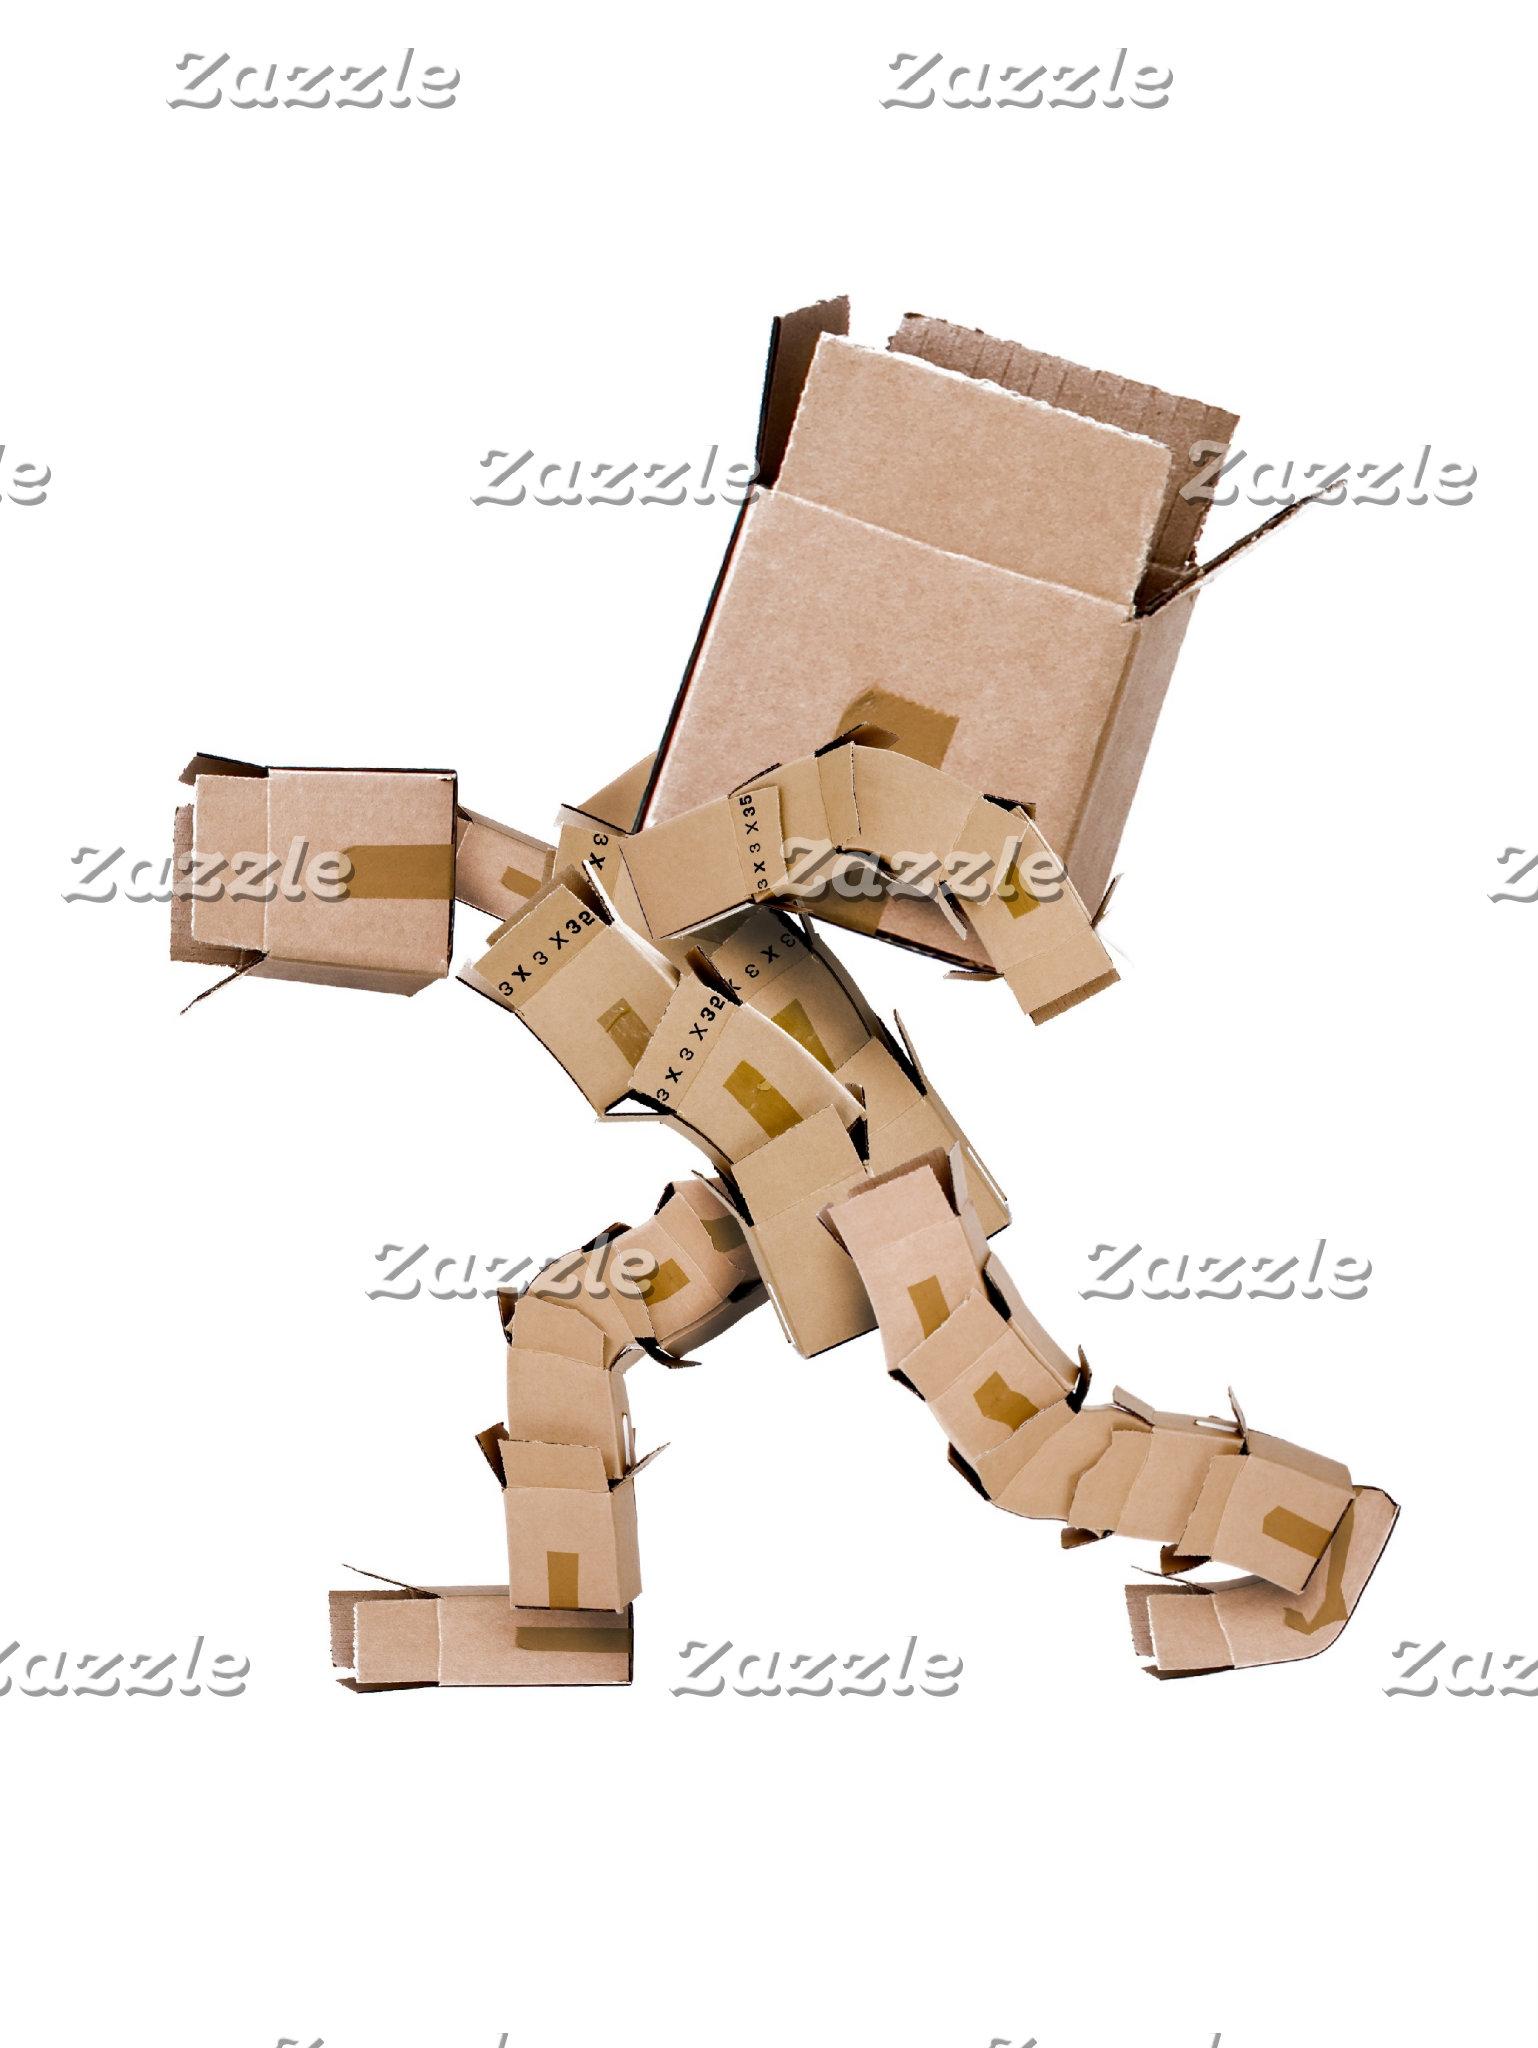 Boxmen Characters